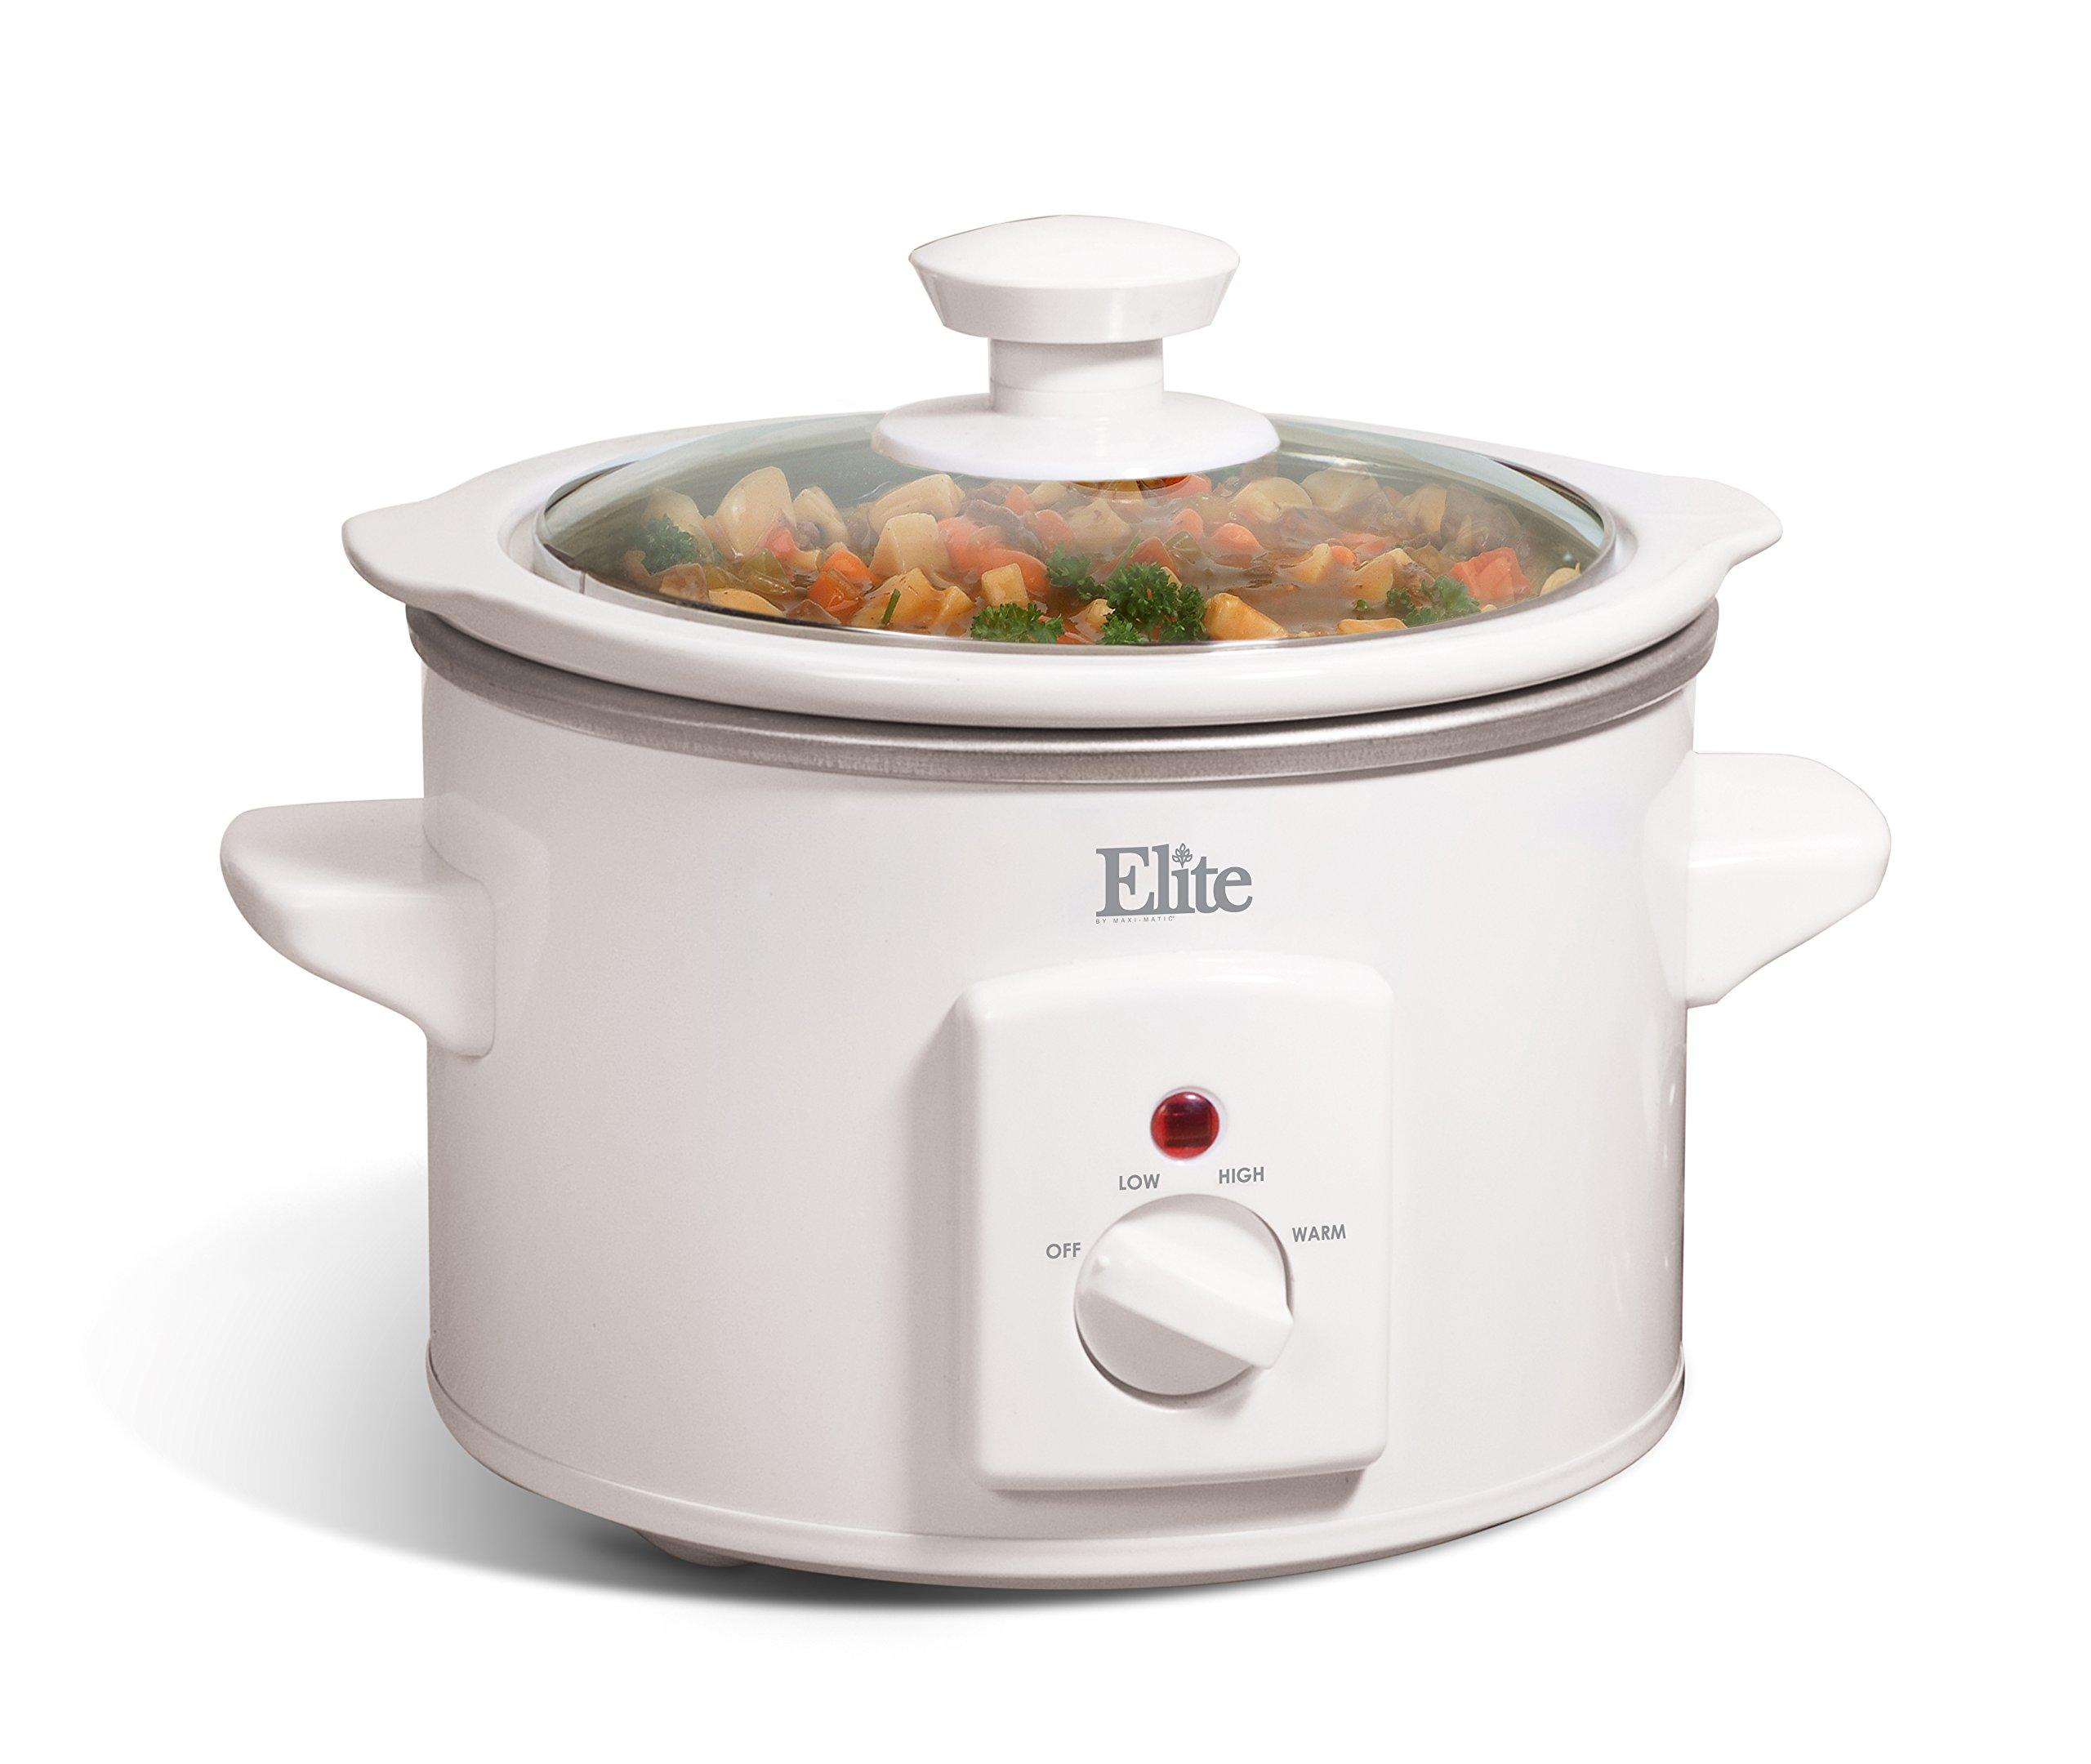 Maxi-Matic MST-250XW Elite Cuisine 1-1/2-Quart Round-Shaped Slow Cooker, White